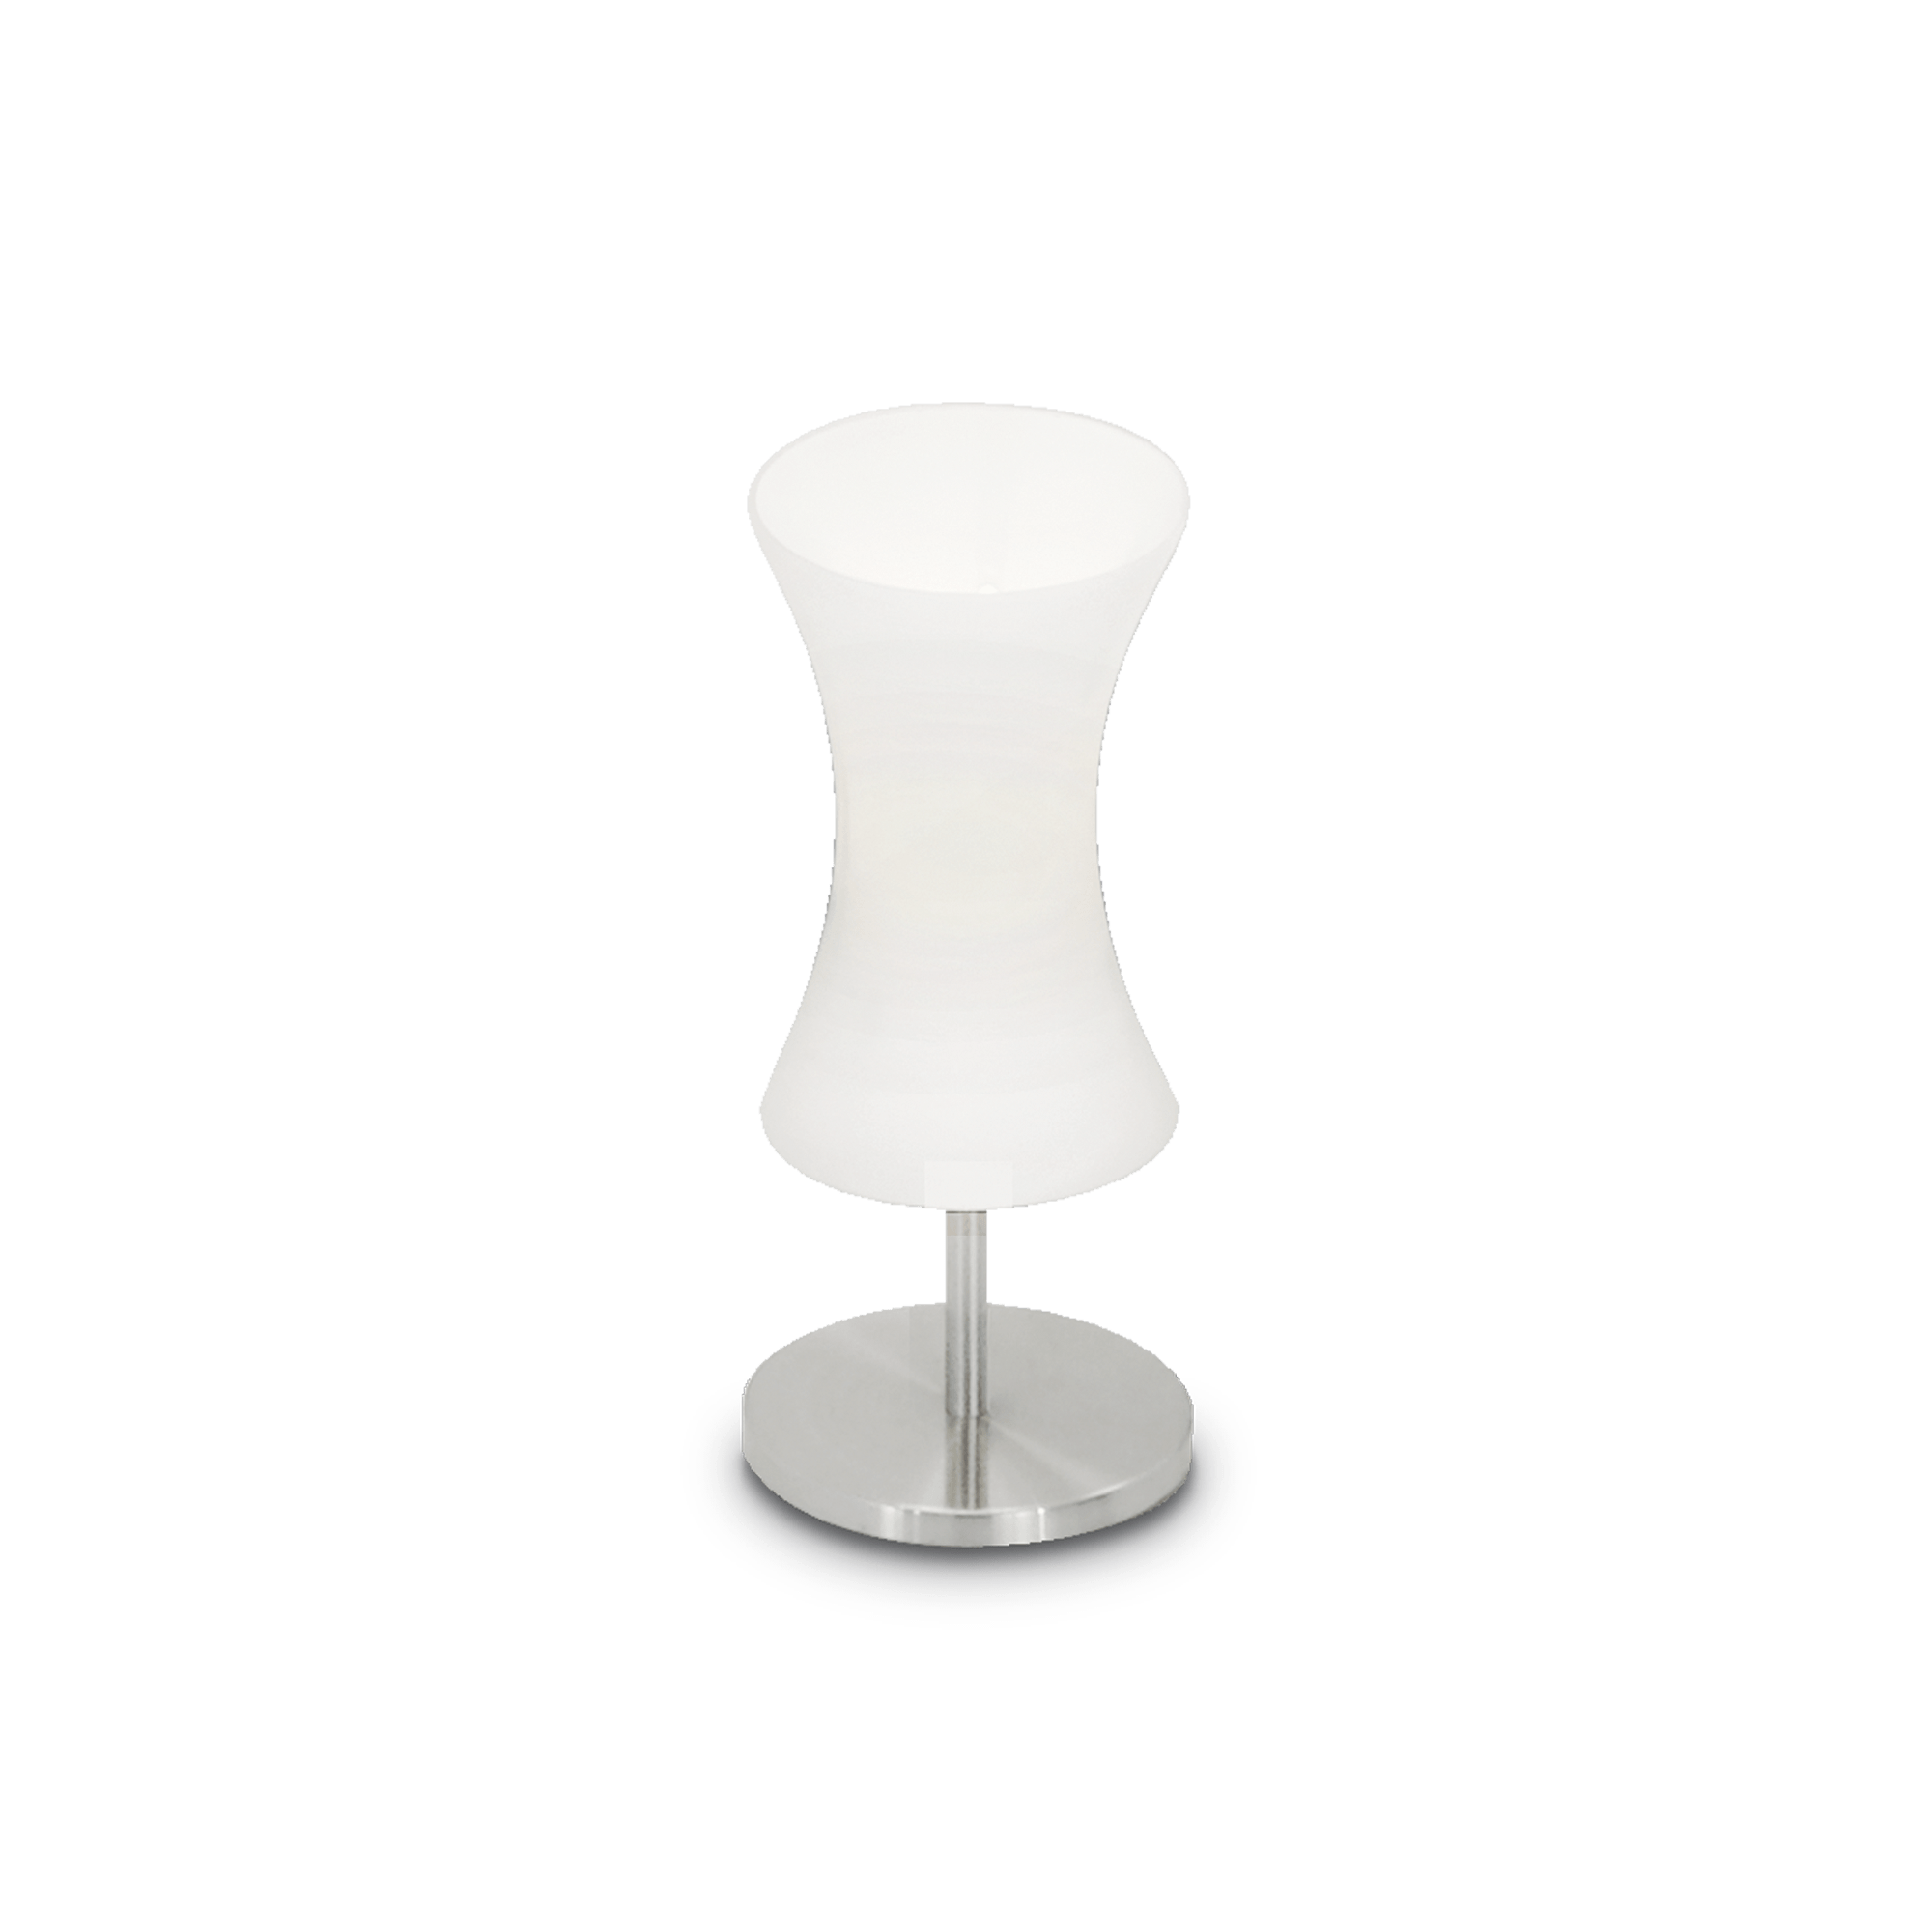 Ideal Lux 014593 Elica TL1 Small asztali lámpa